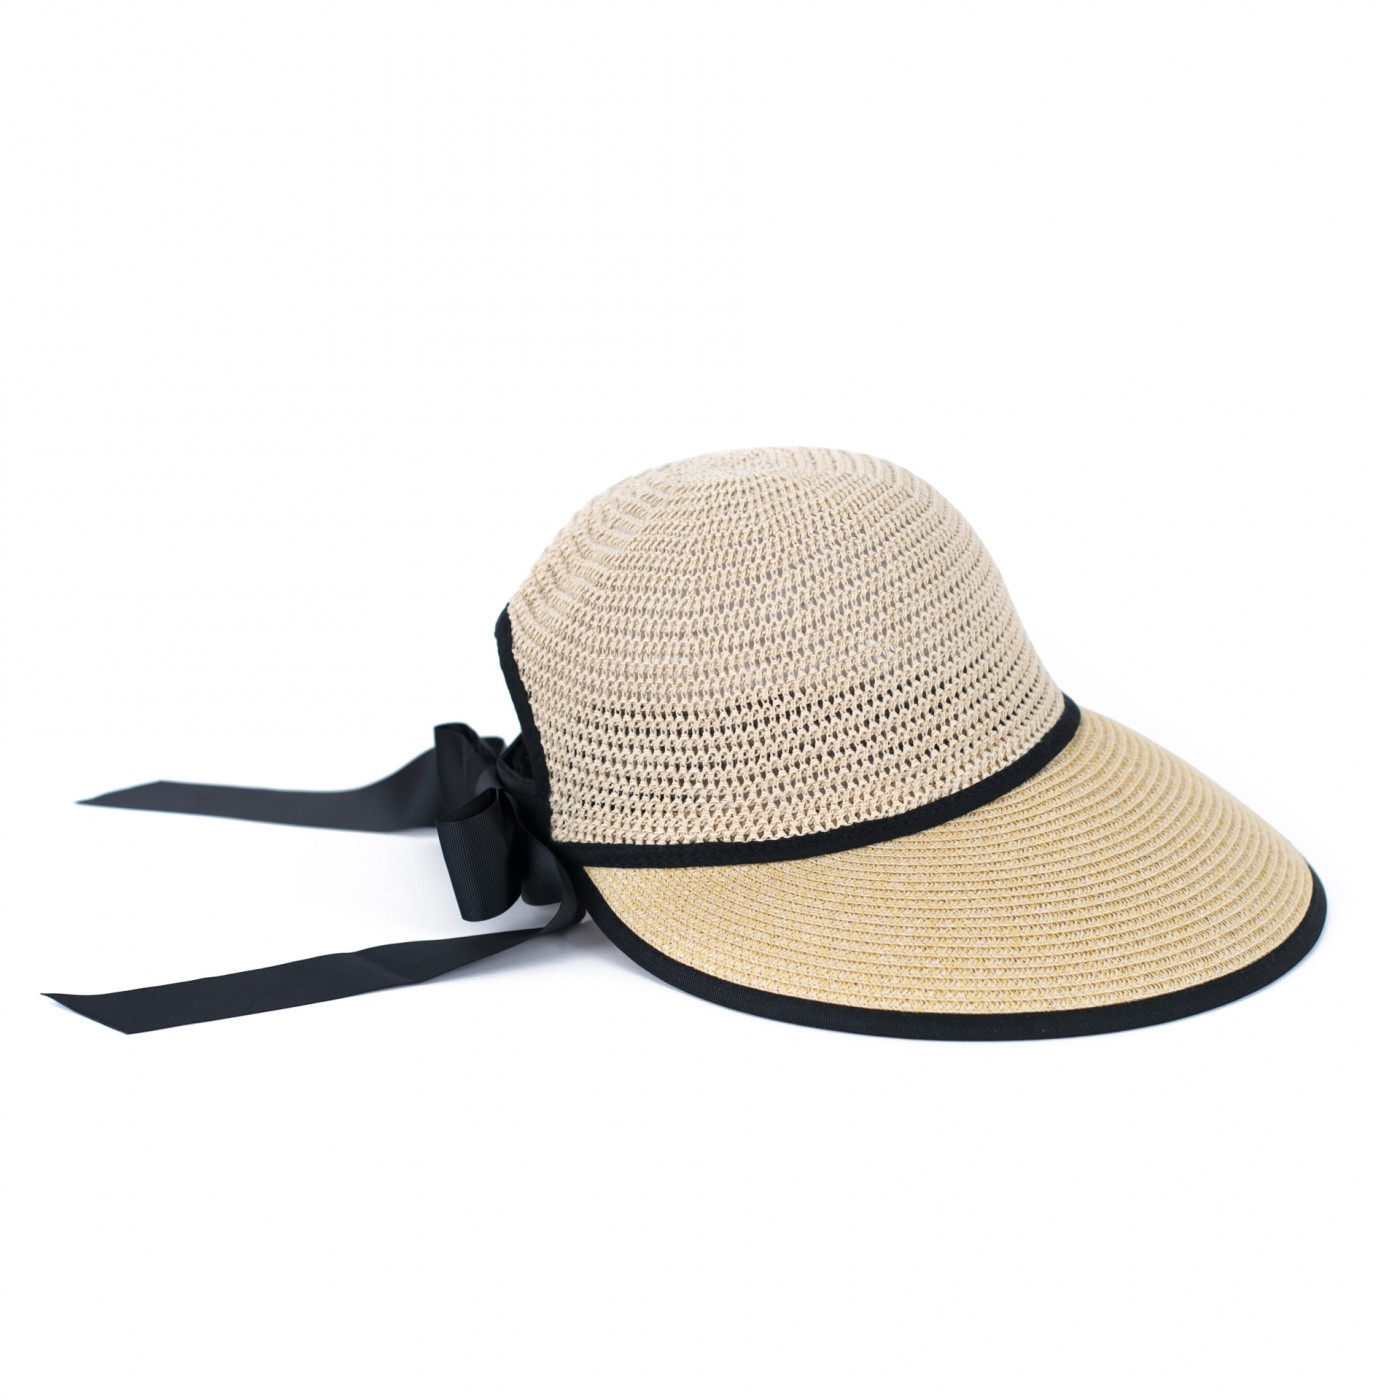 Art Of Polo Woman's Hat cz19319